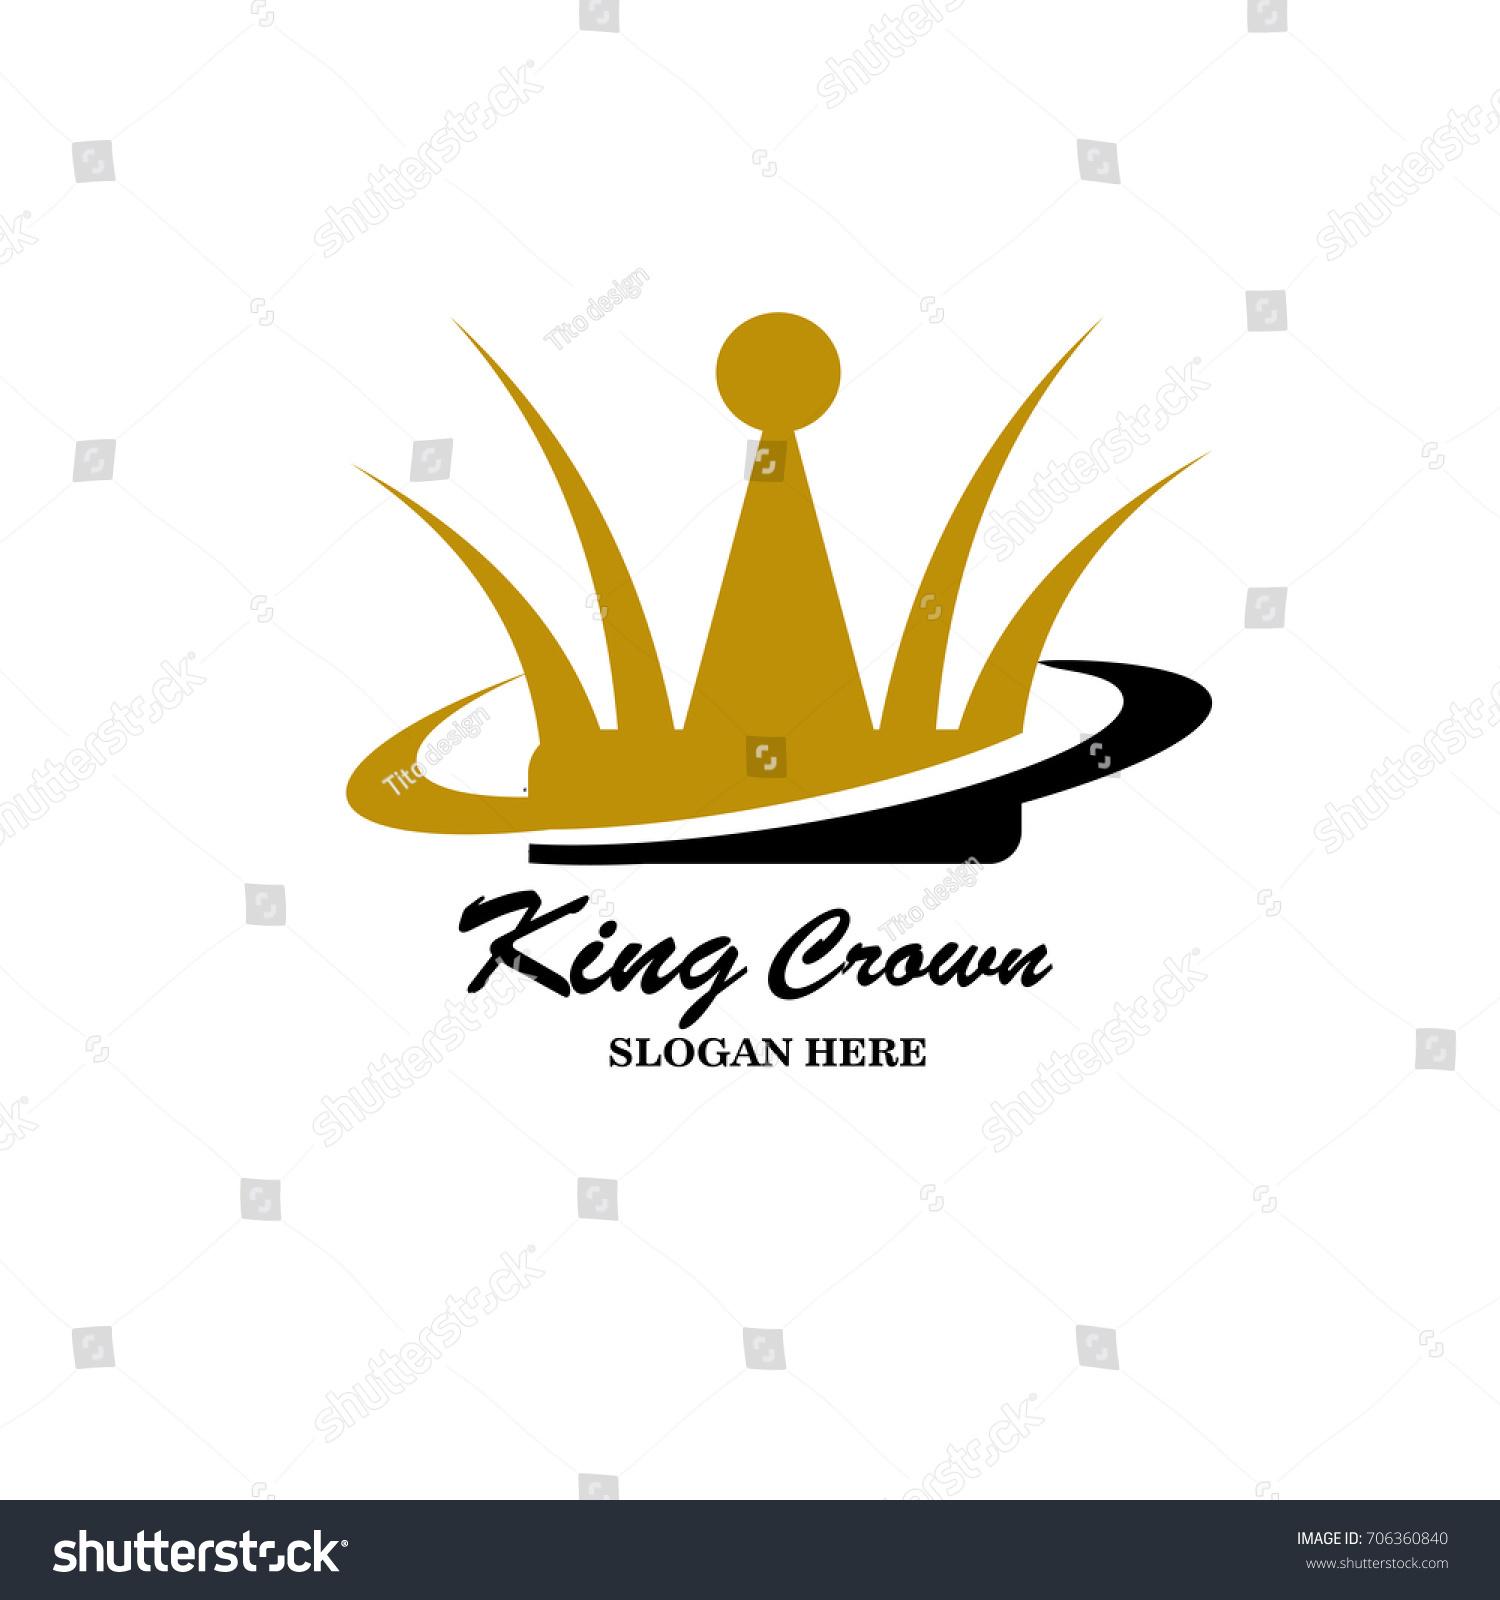 Online Royalty King Crown logo design  Free Logo Maker